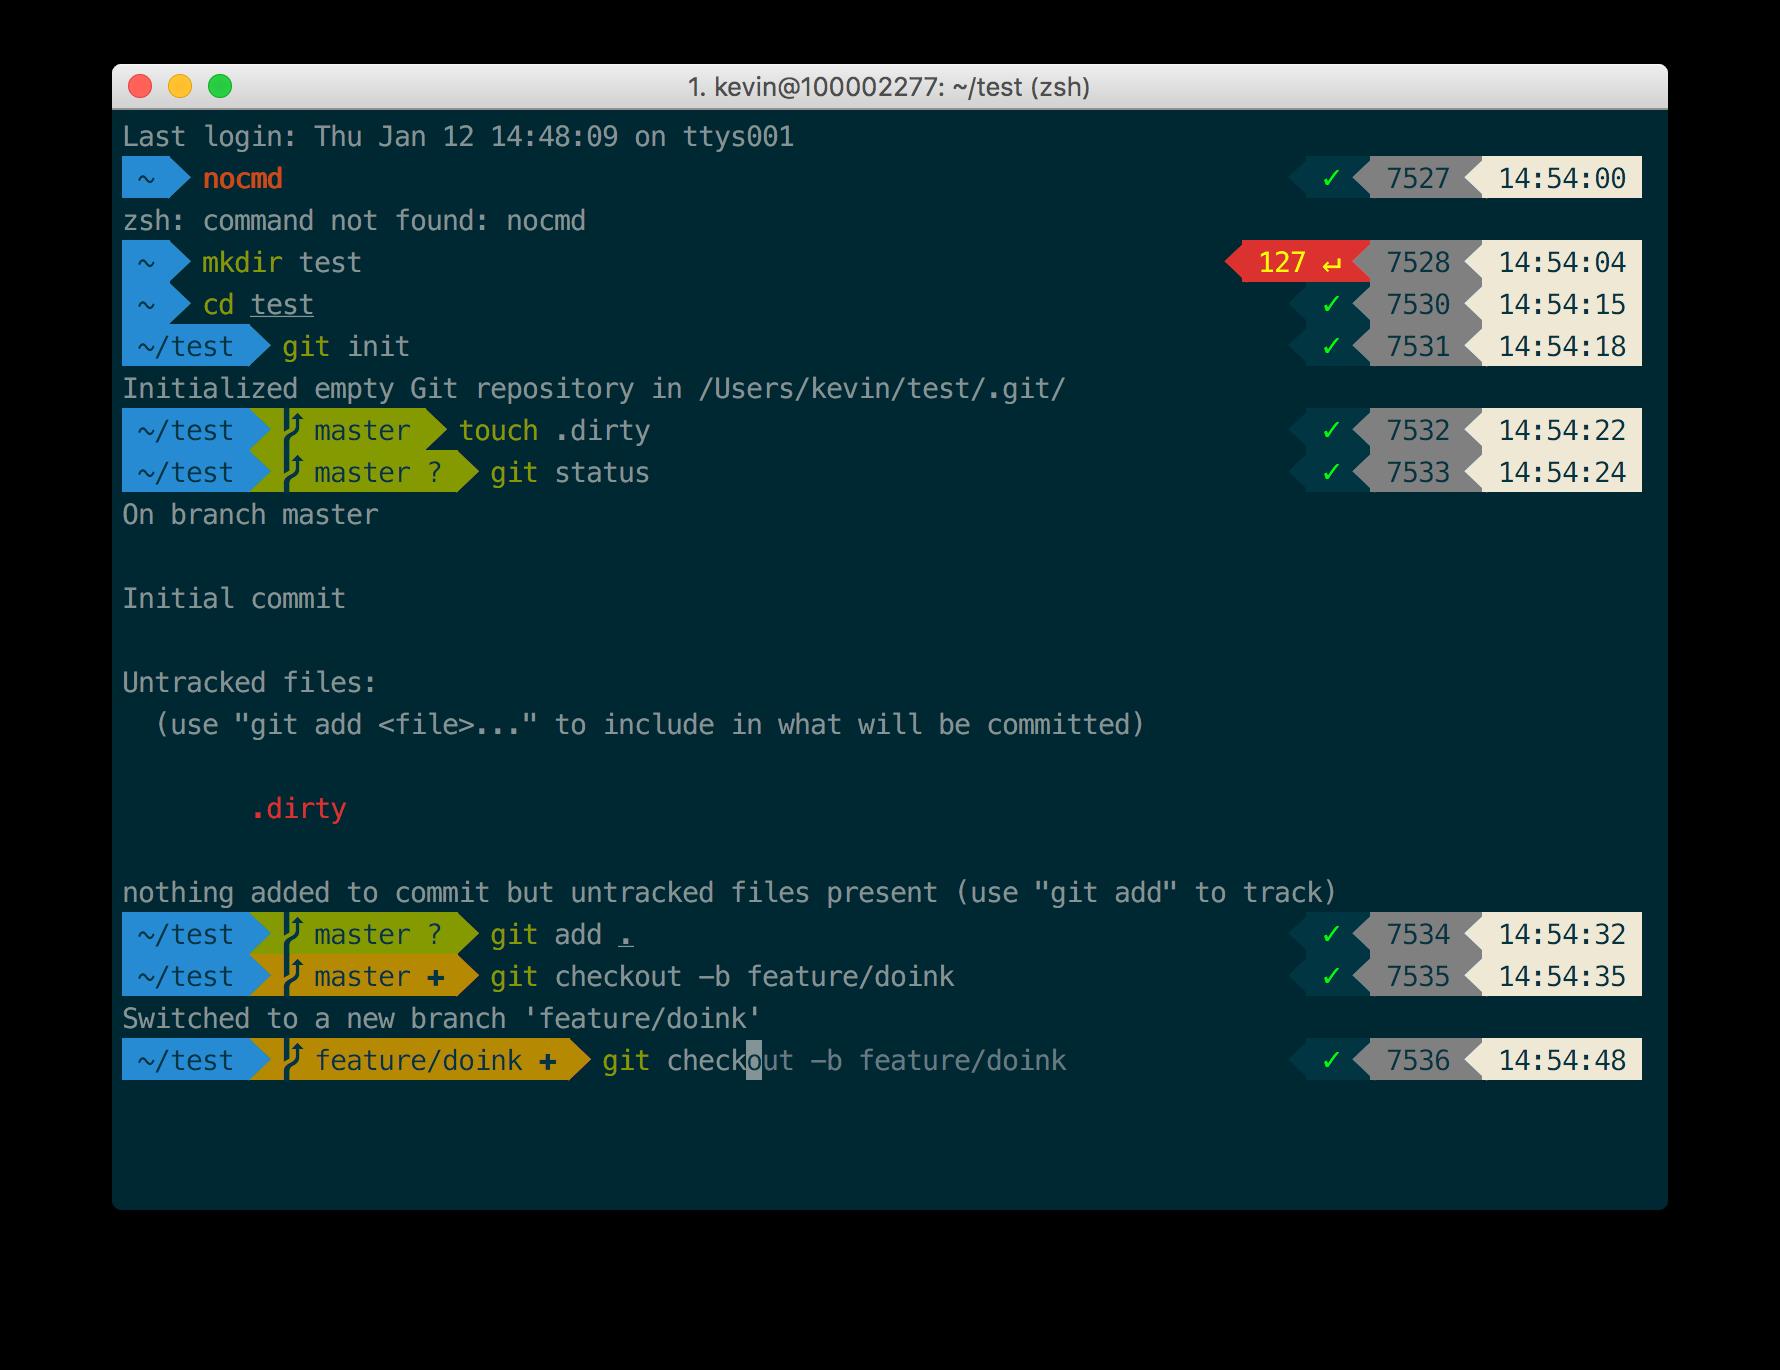 iTerm2 + Oh My Zsh + Solarized color scheme + Meslo powerline font + [Powerlevel9k]